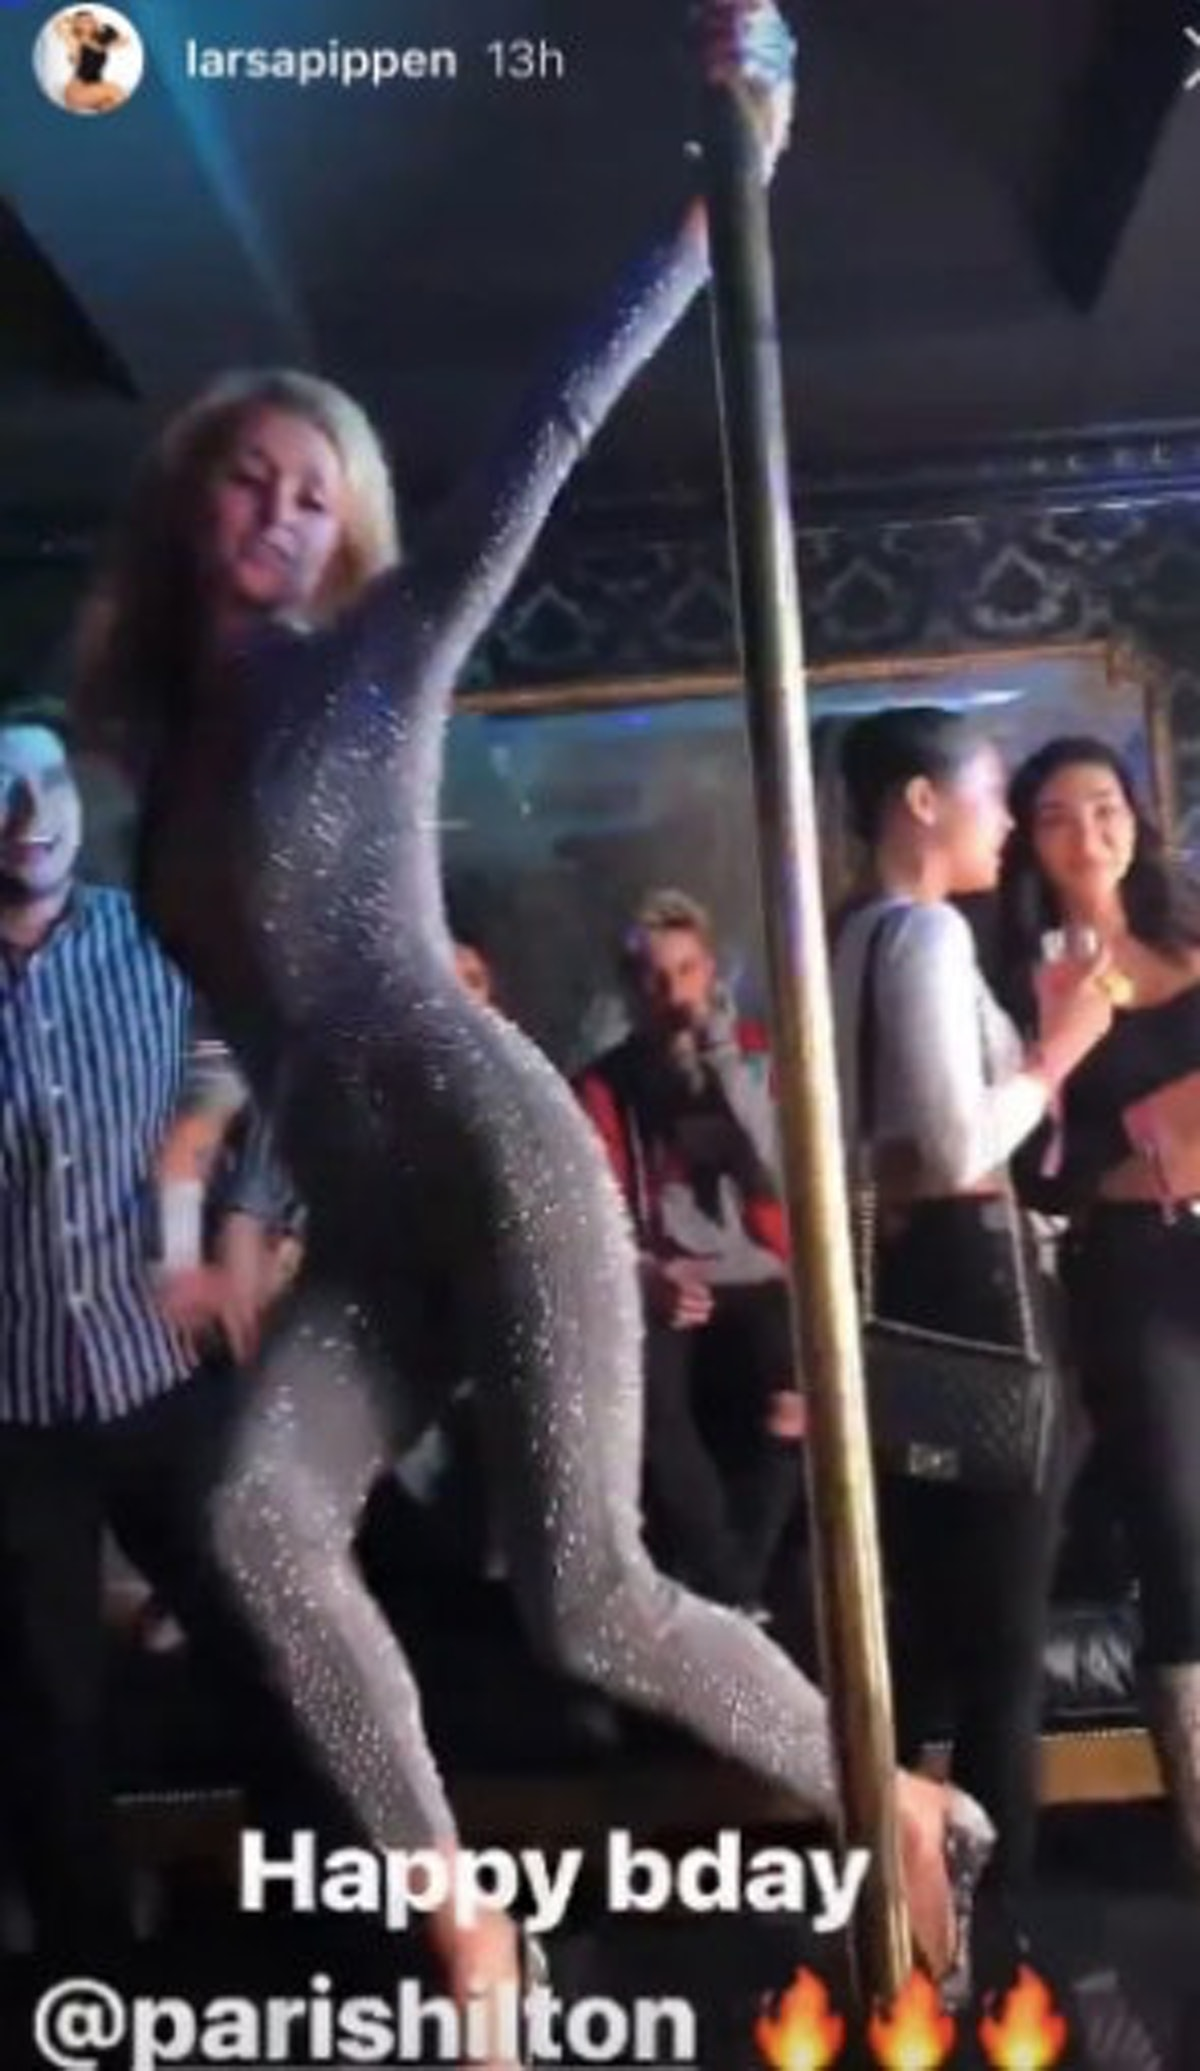 The Kardashians and Larsa Pippen's Mutual Friends Include Paris Hilton.